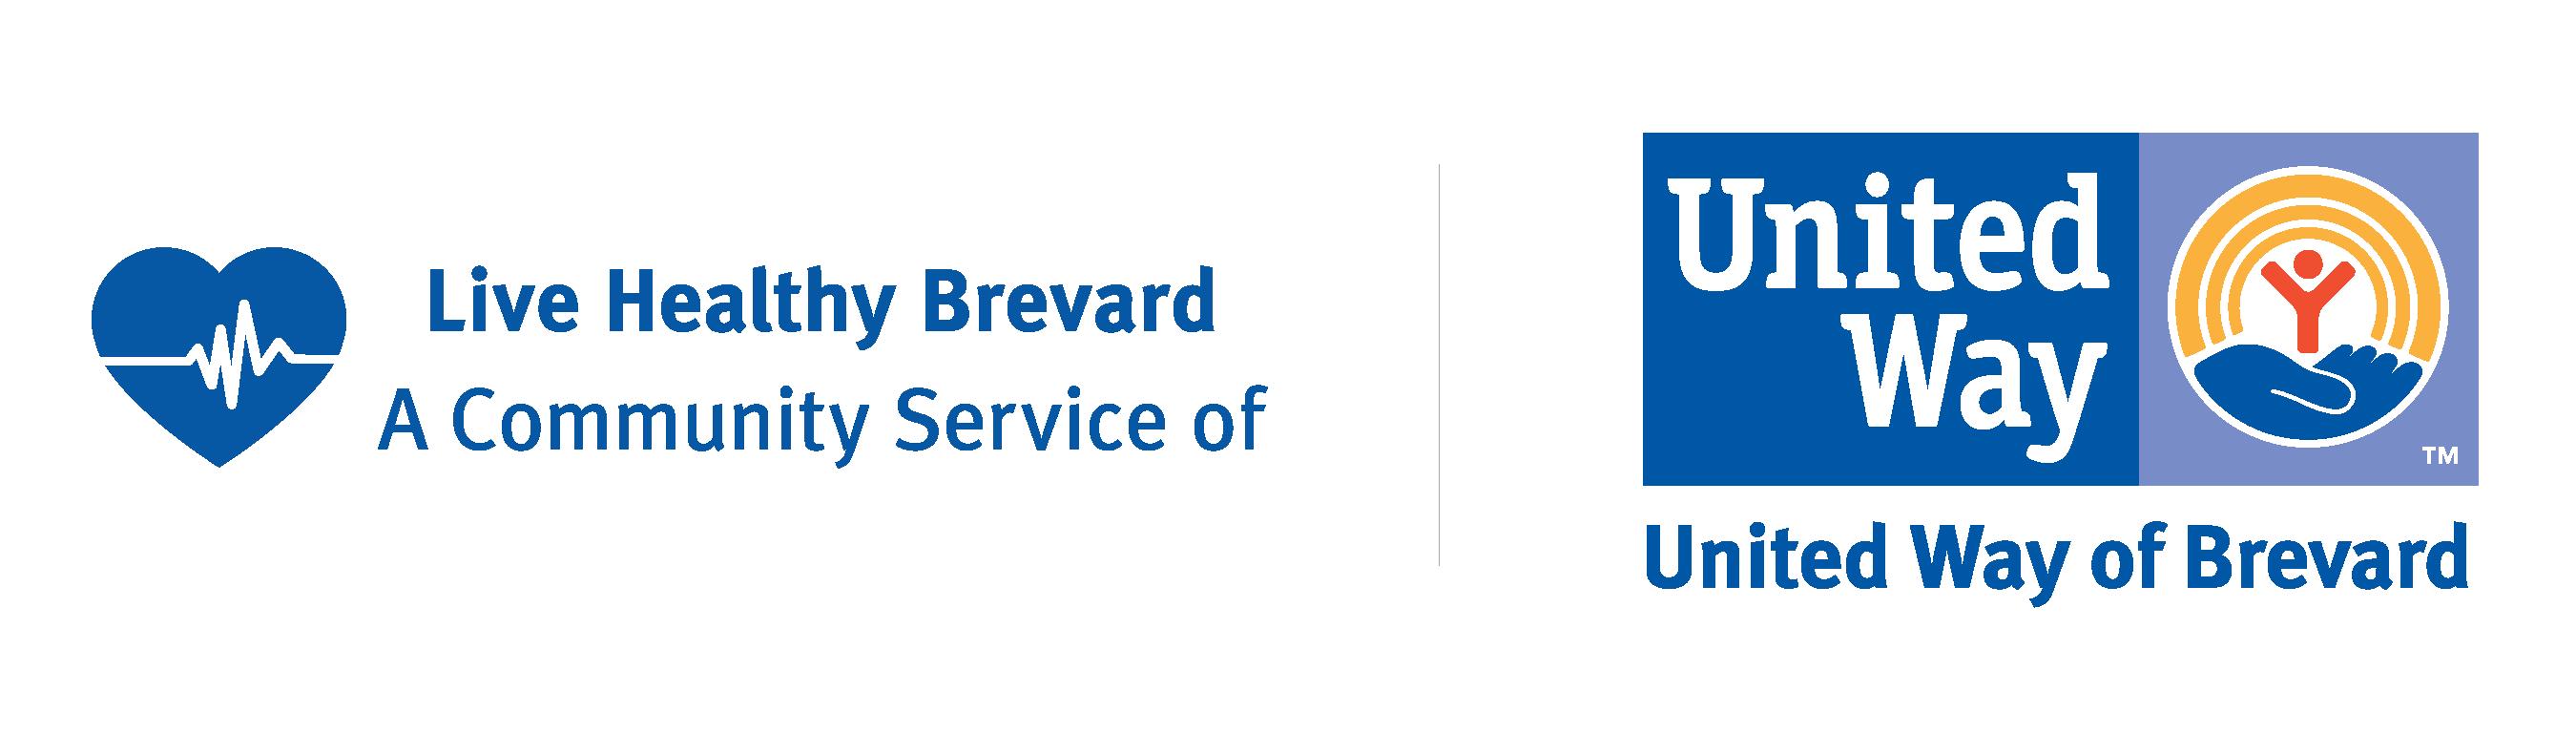 Live Healthy Brevard Logo